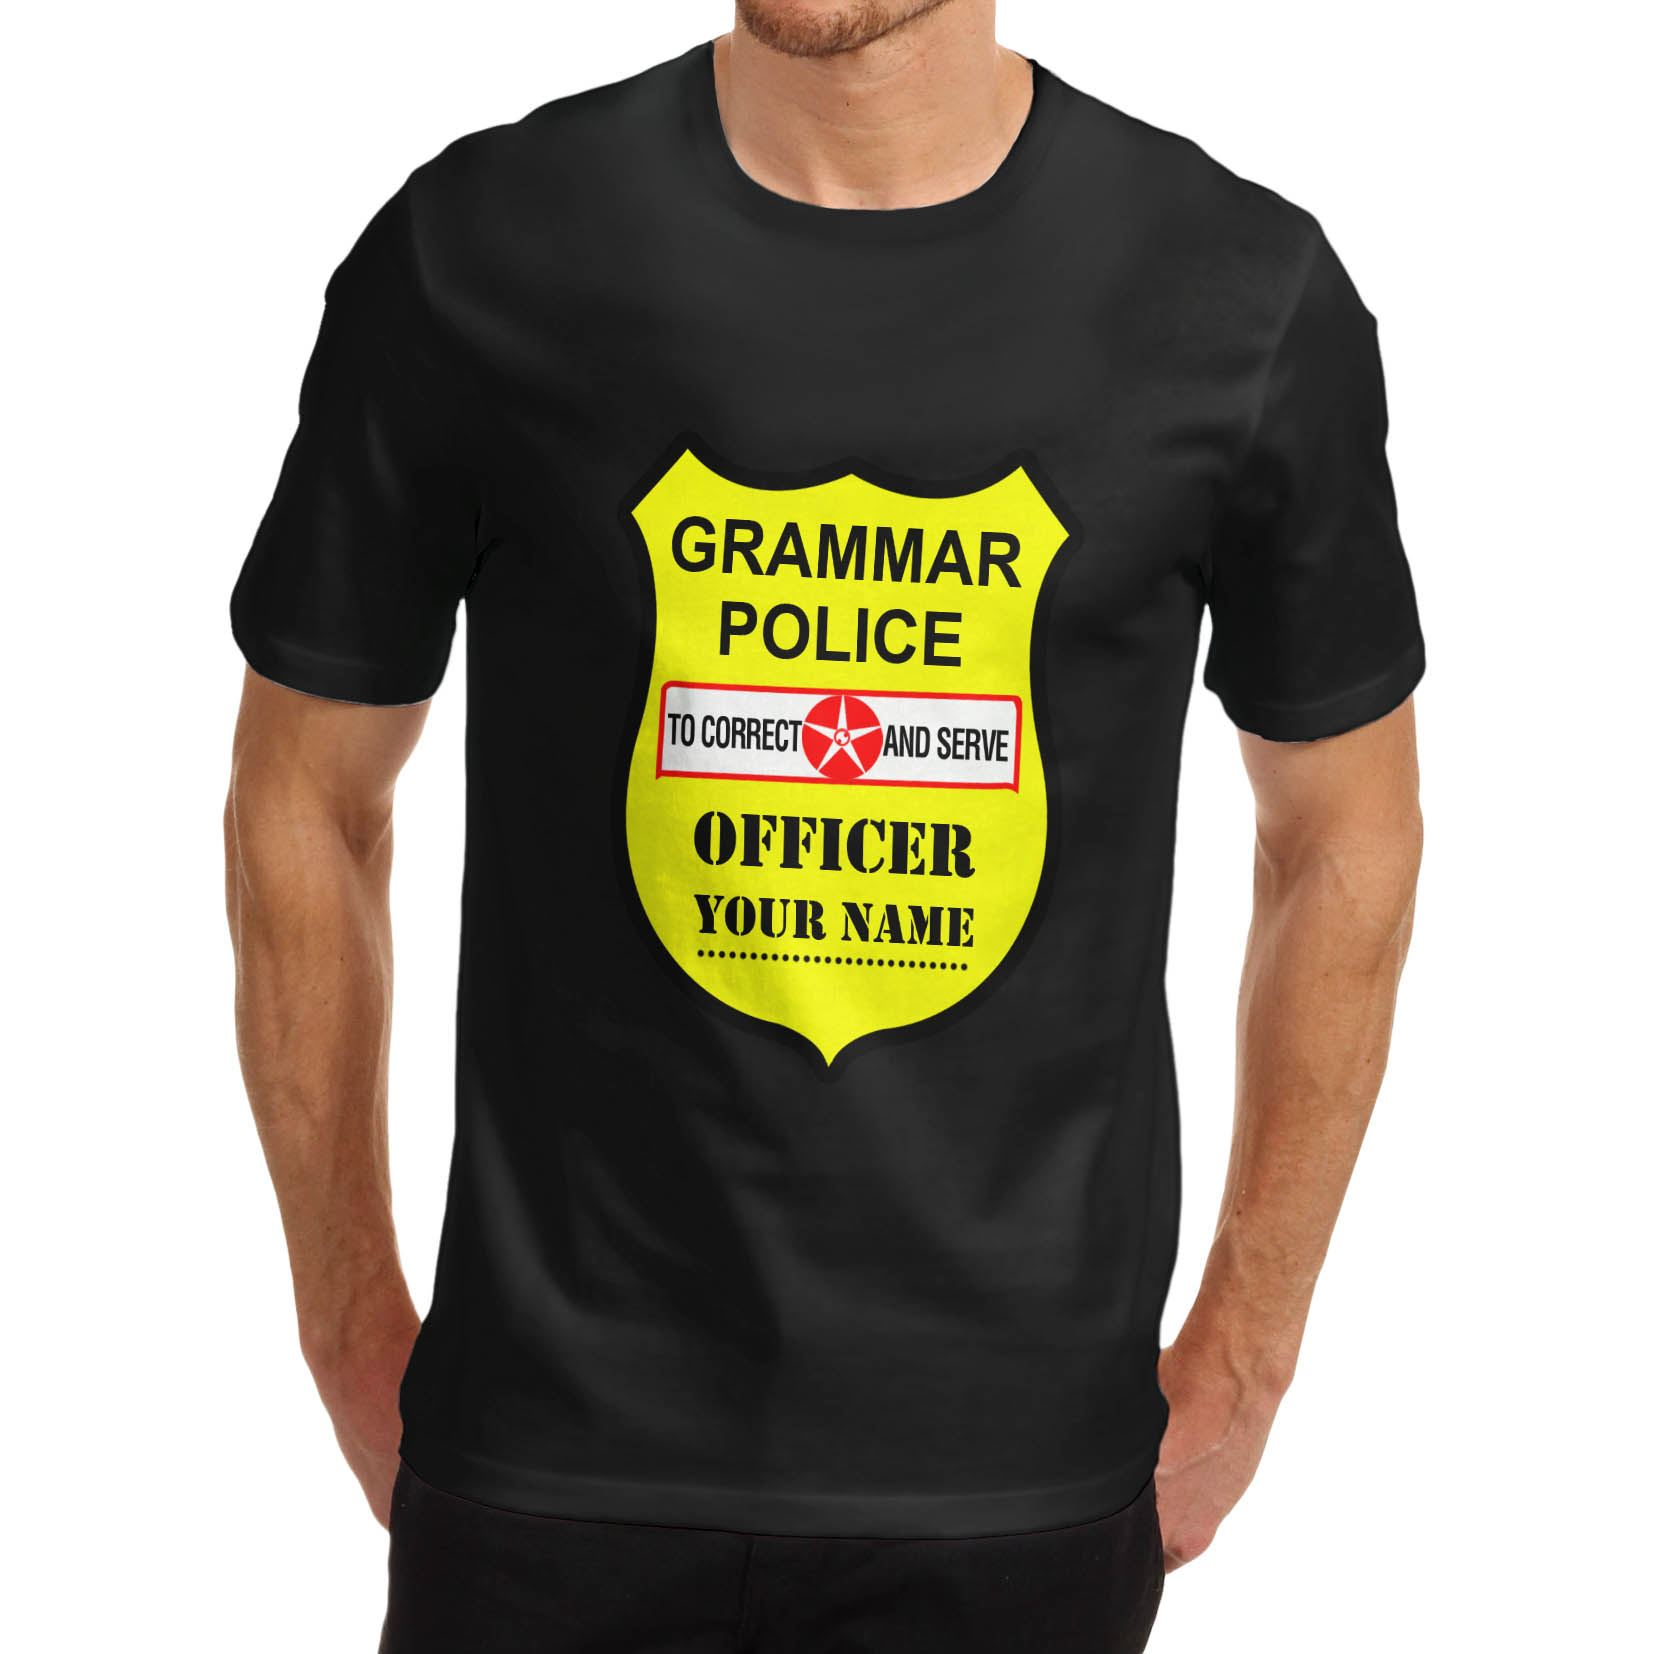 Black t shirt ebay - Twisted Envy Men 039 S Personalised Grammar Police